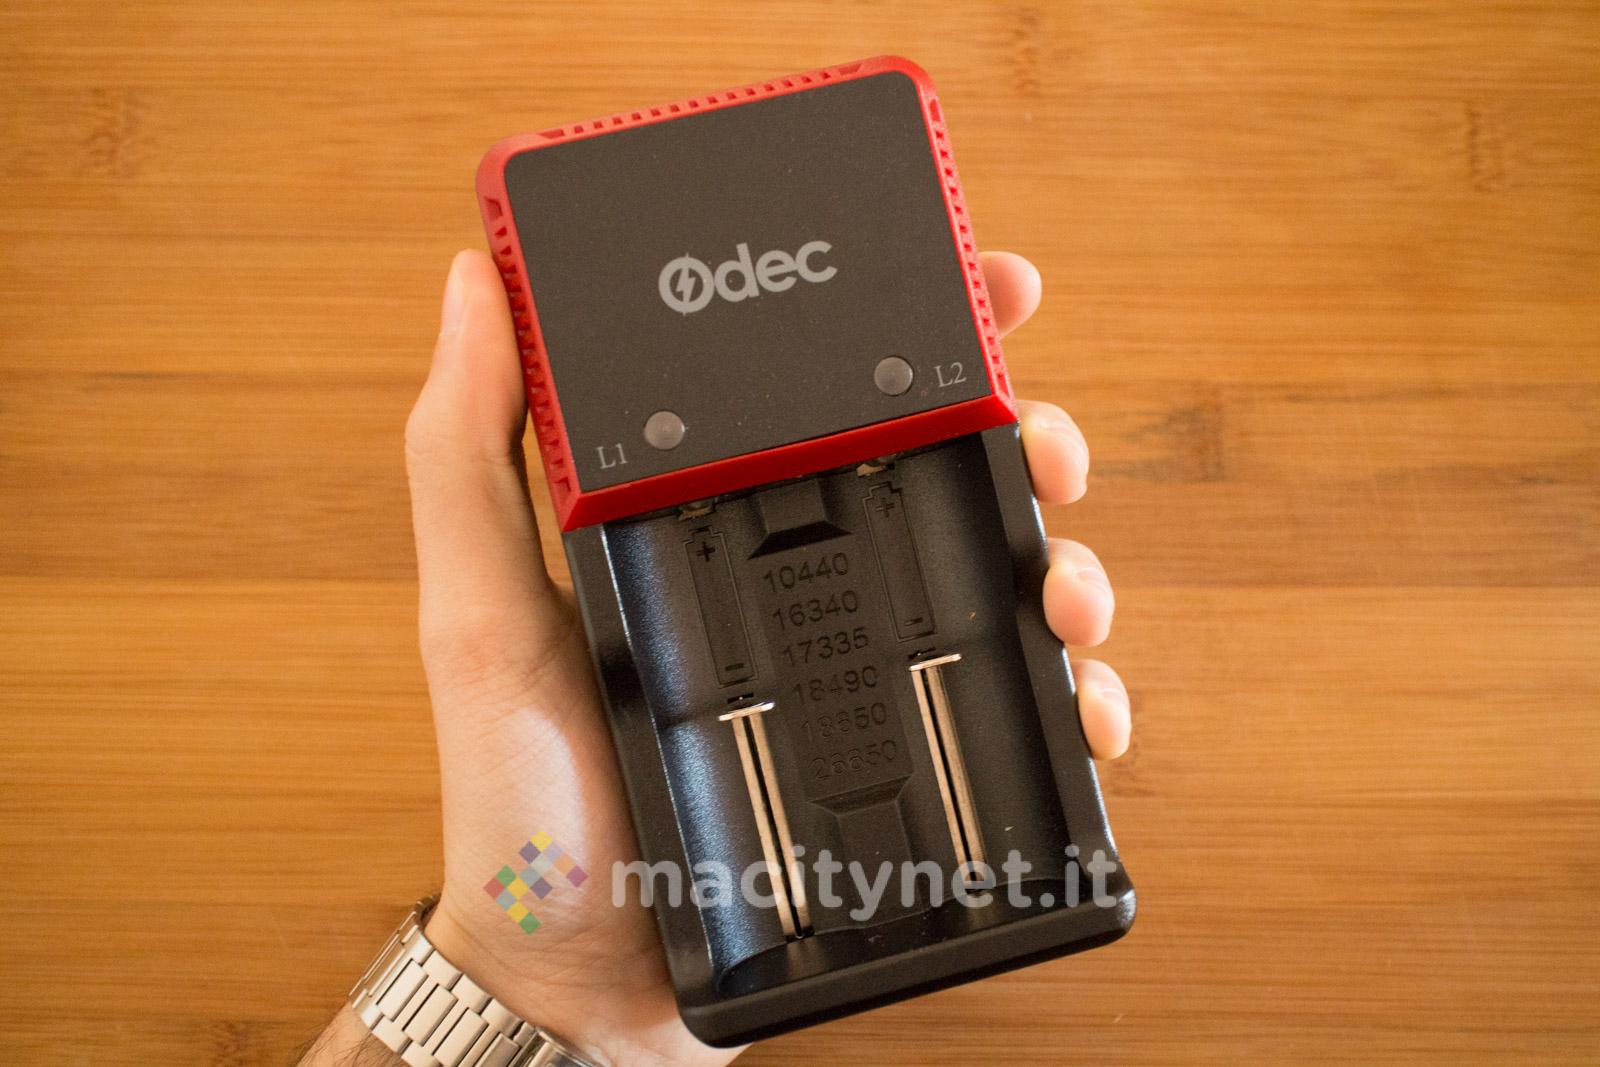 Batterie Odec